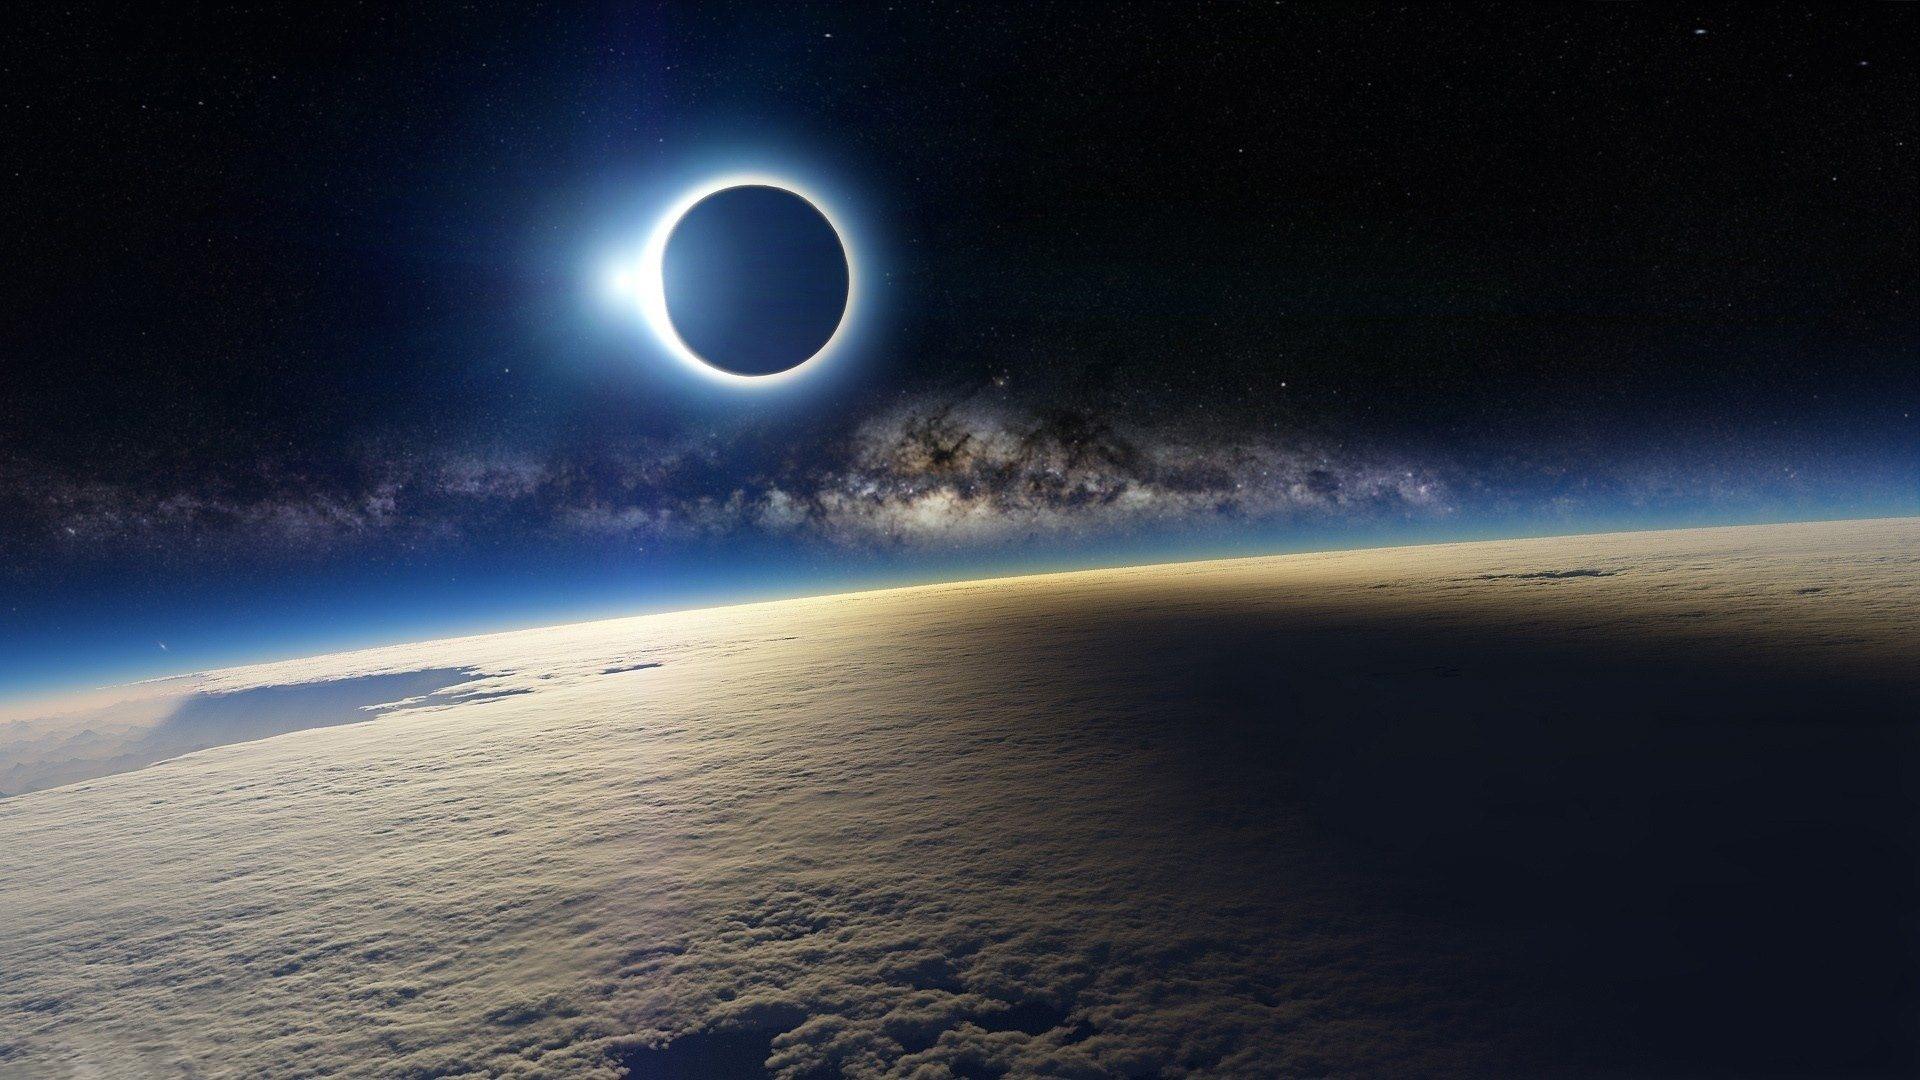 earth and moon wallpaper hd 33271